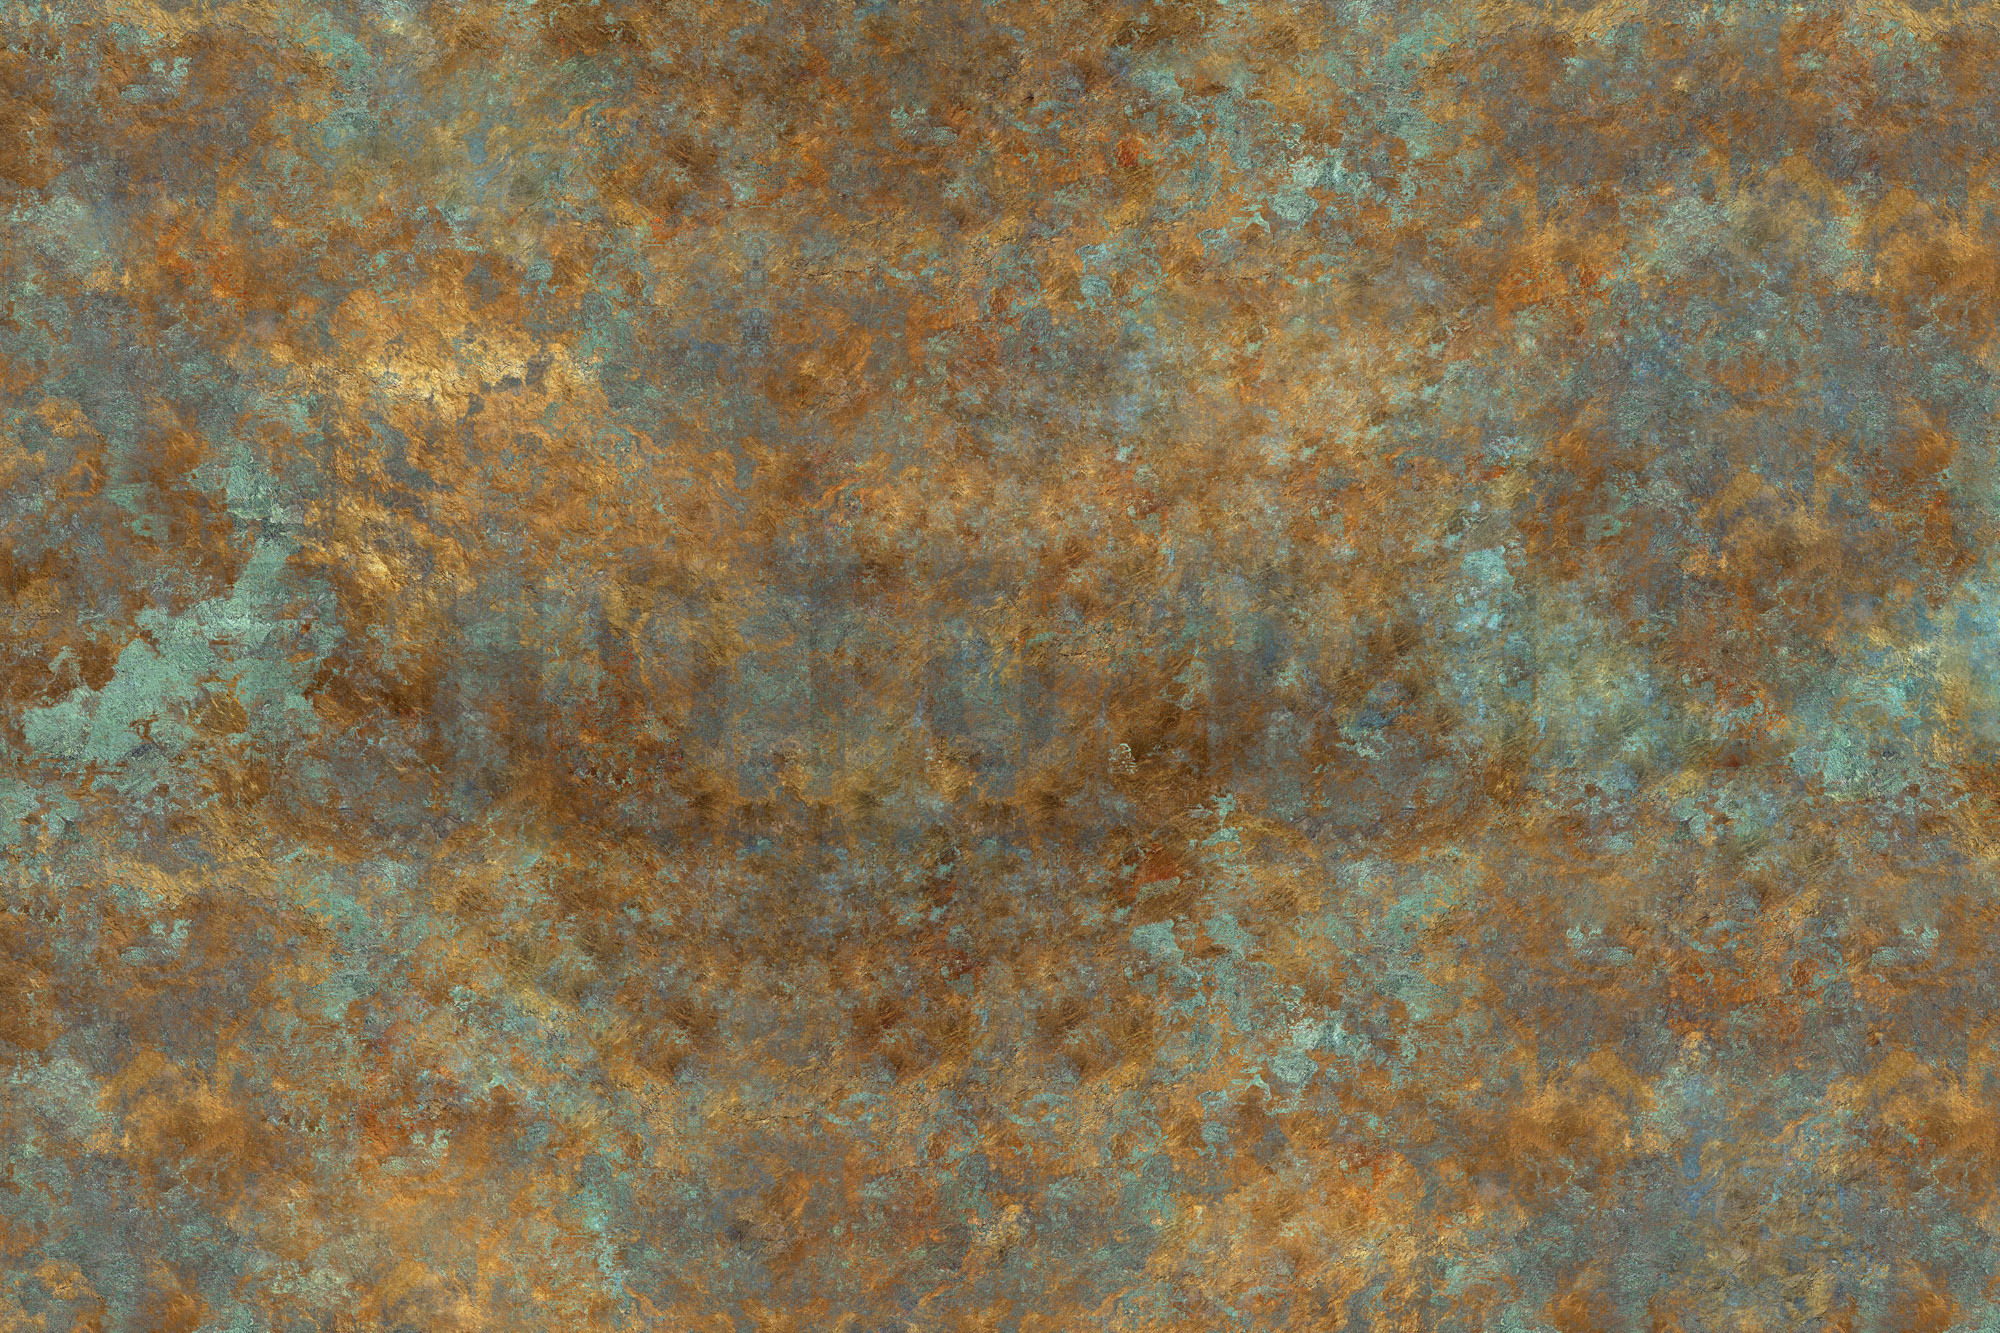 Vintage Bronze Background – Wall Mural & Photo Wallpaper – Photowall